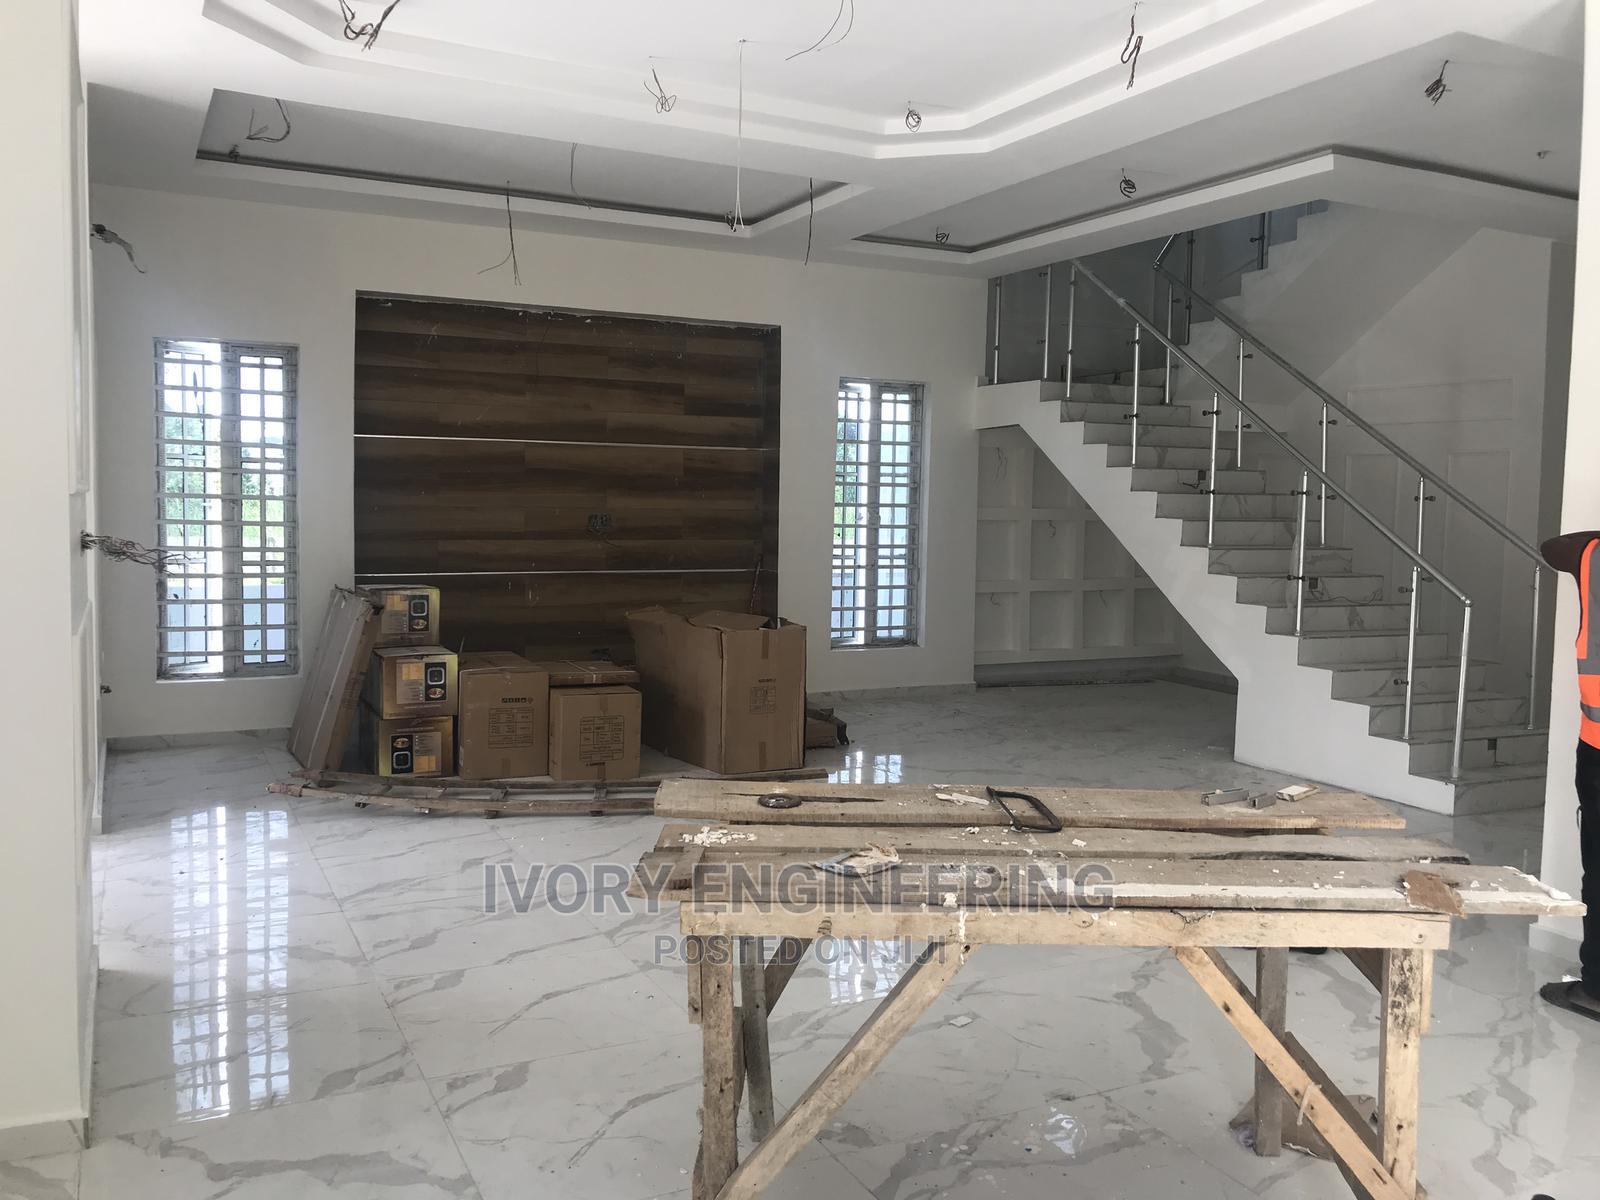 5bdrm Duplex in Lekki Phase 1 for Sale | Houses & Apartments For Sale for sale in Lekki Phase 1, Lekki, Nigeria